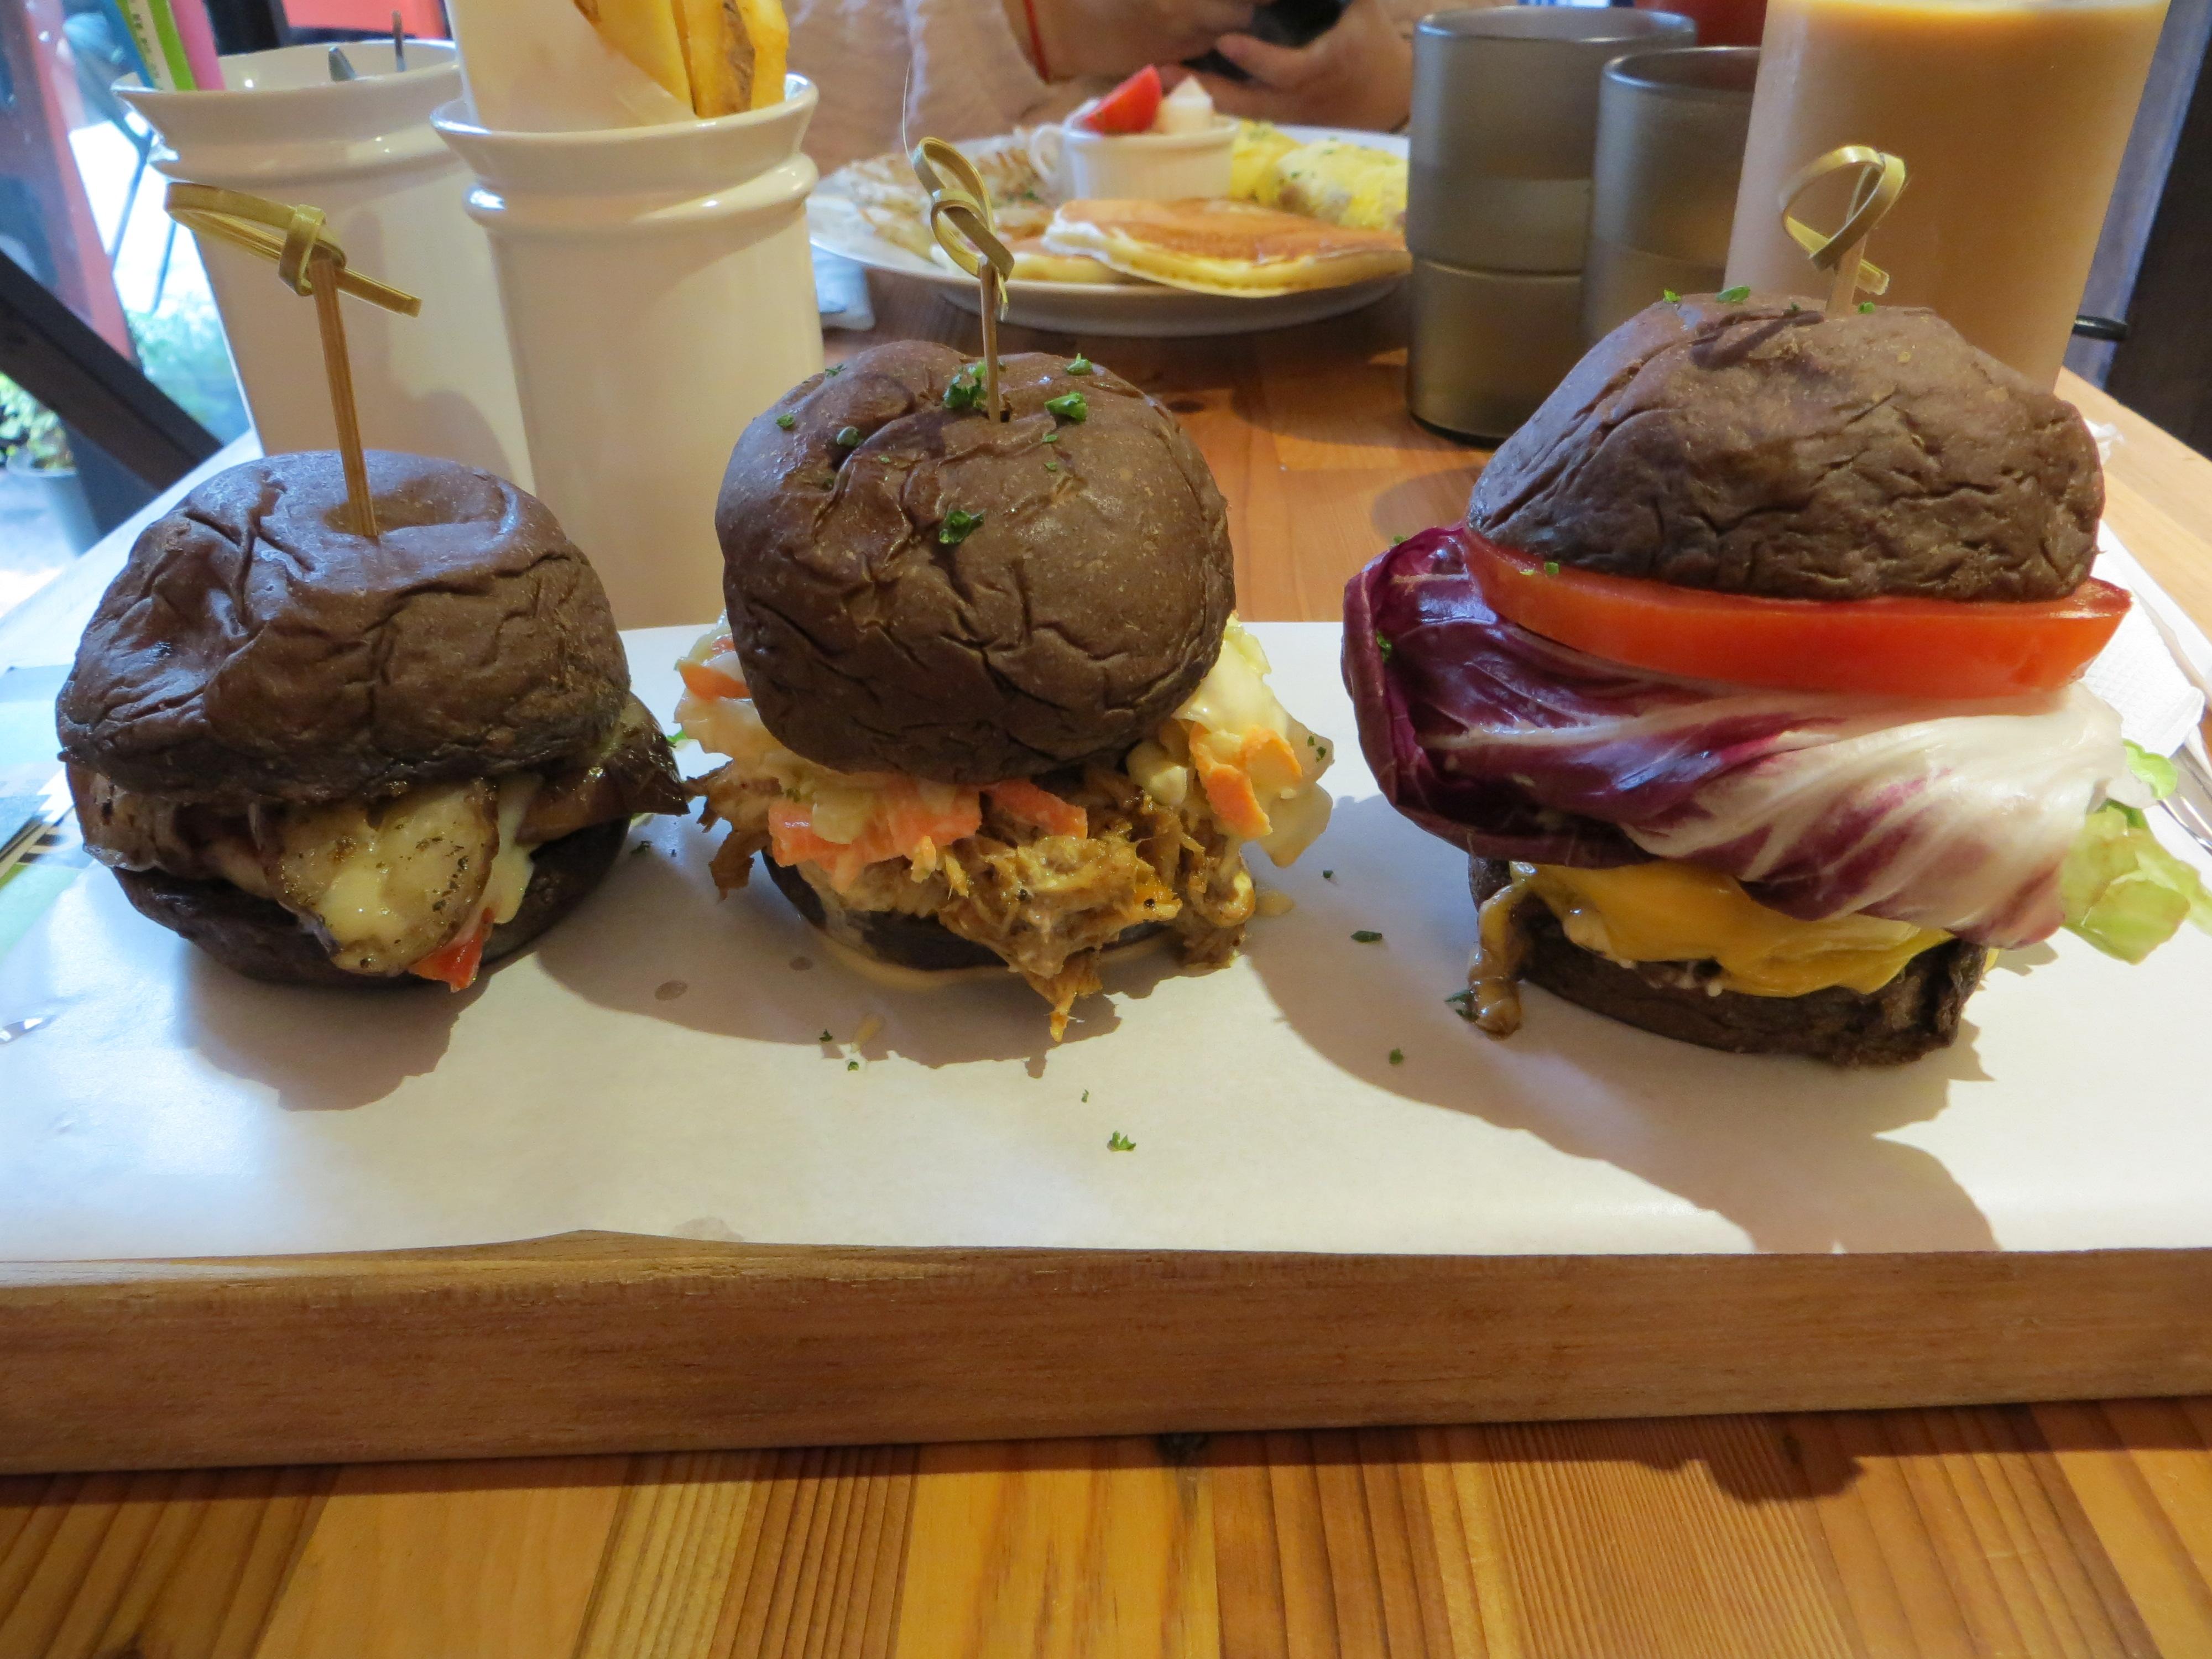 Urban Park kitchen & cafe都會享食|台北美食︱美食王國